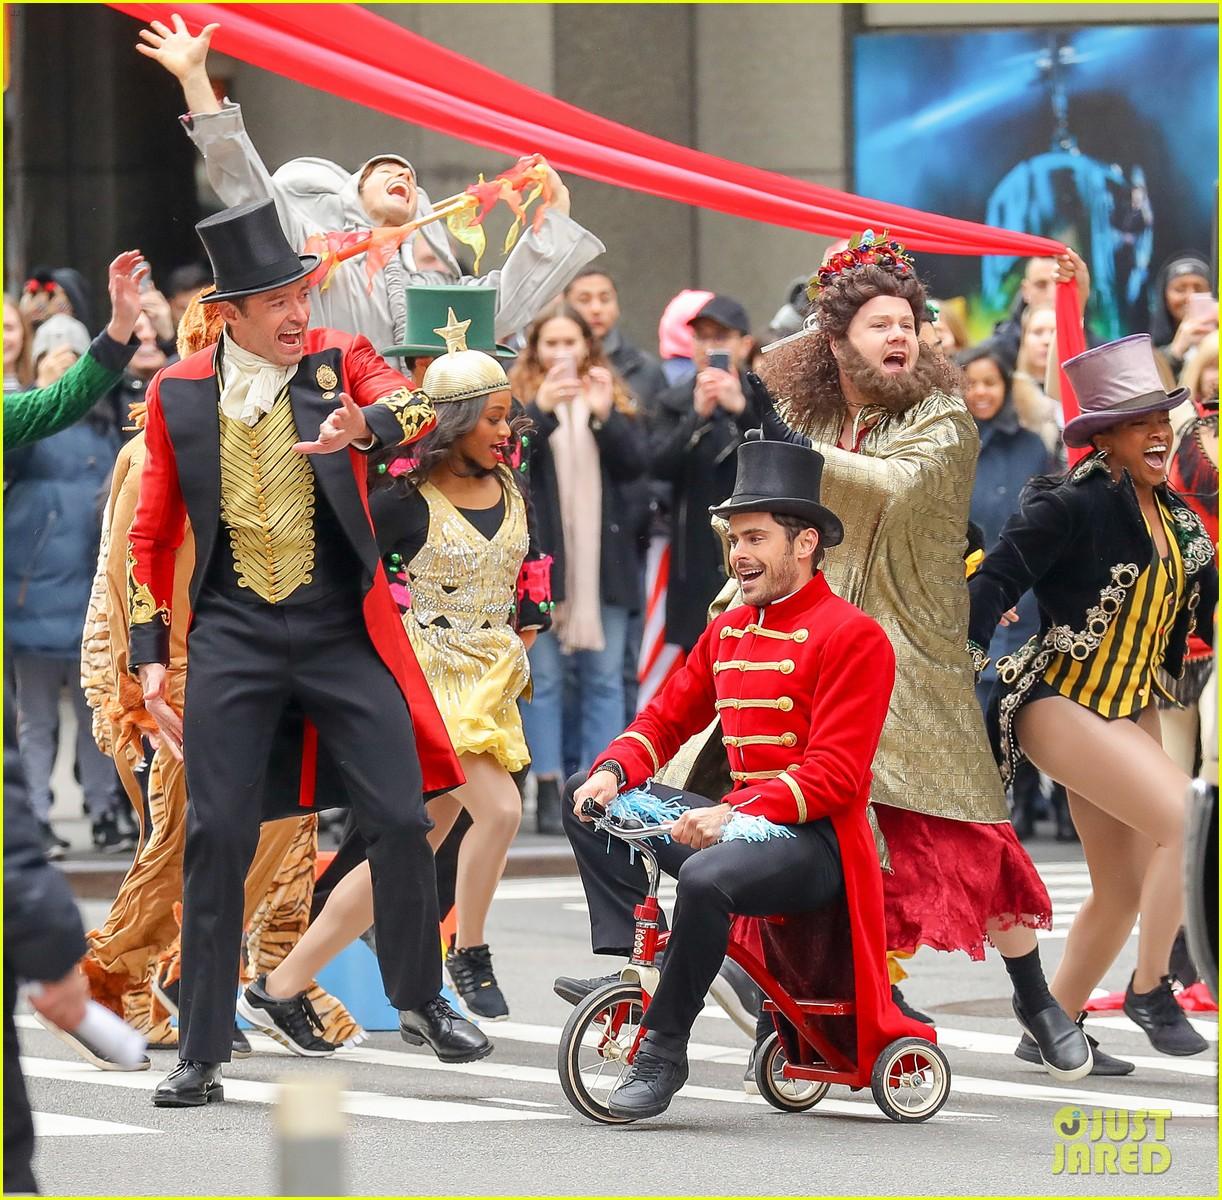 Zac Efron Zendaya Promote The Greatest Showman In Costume